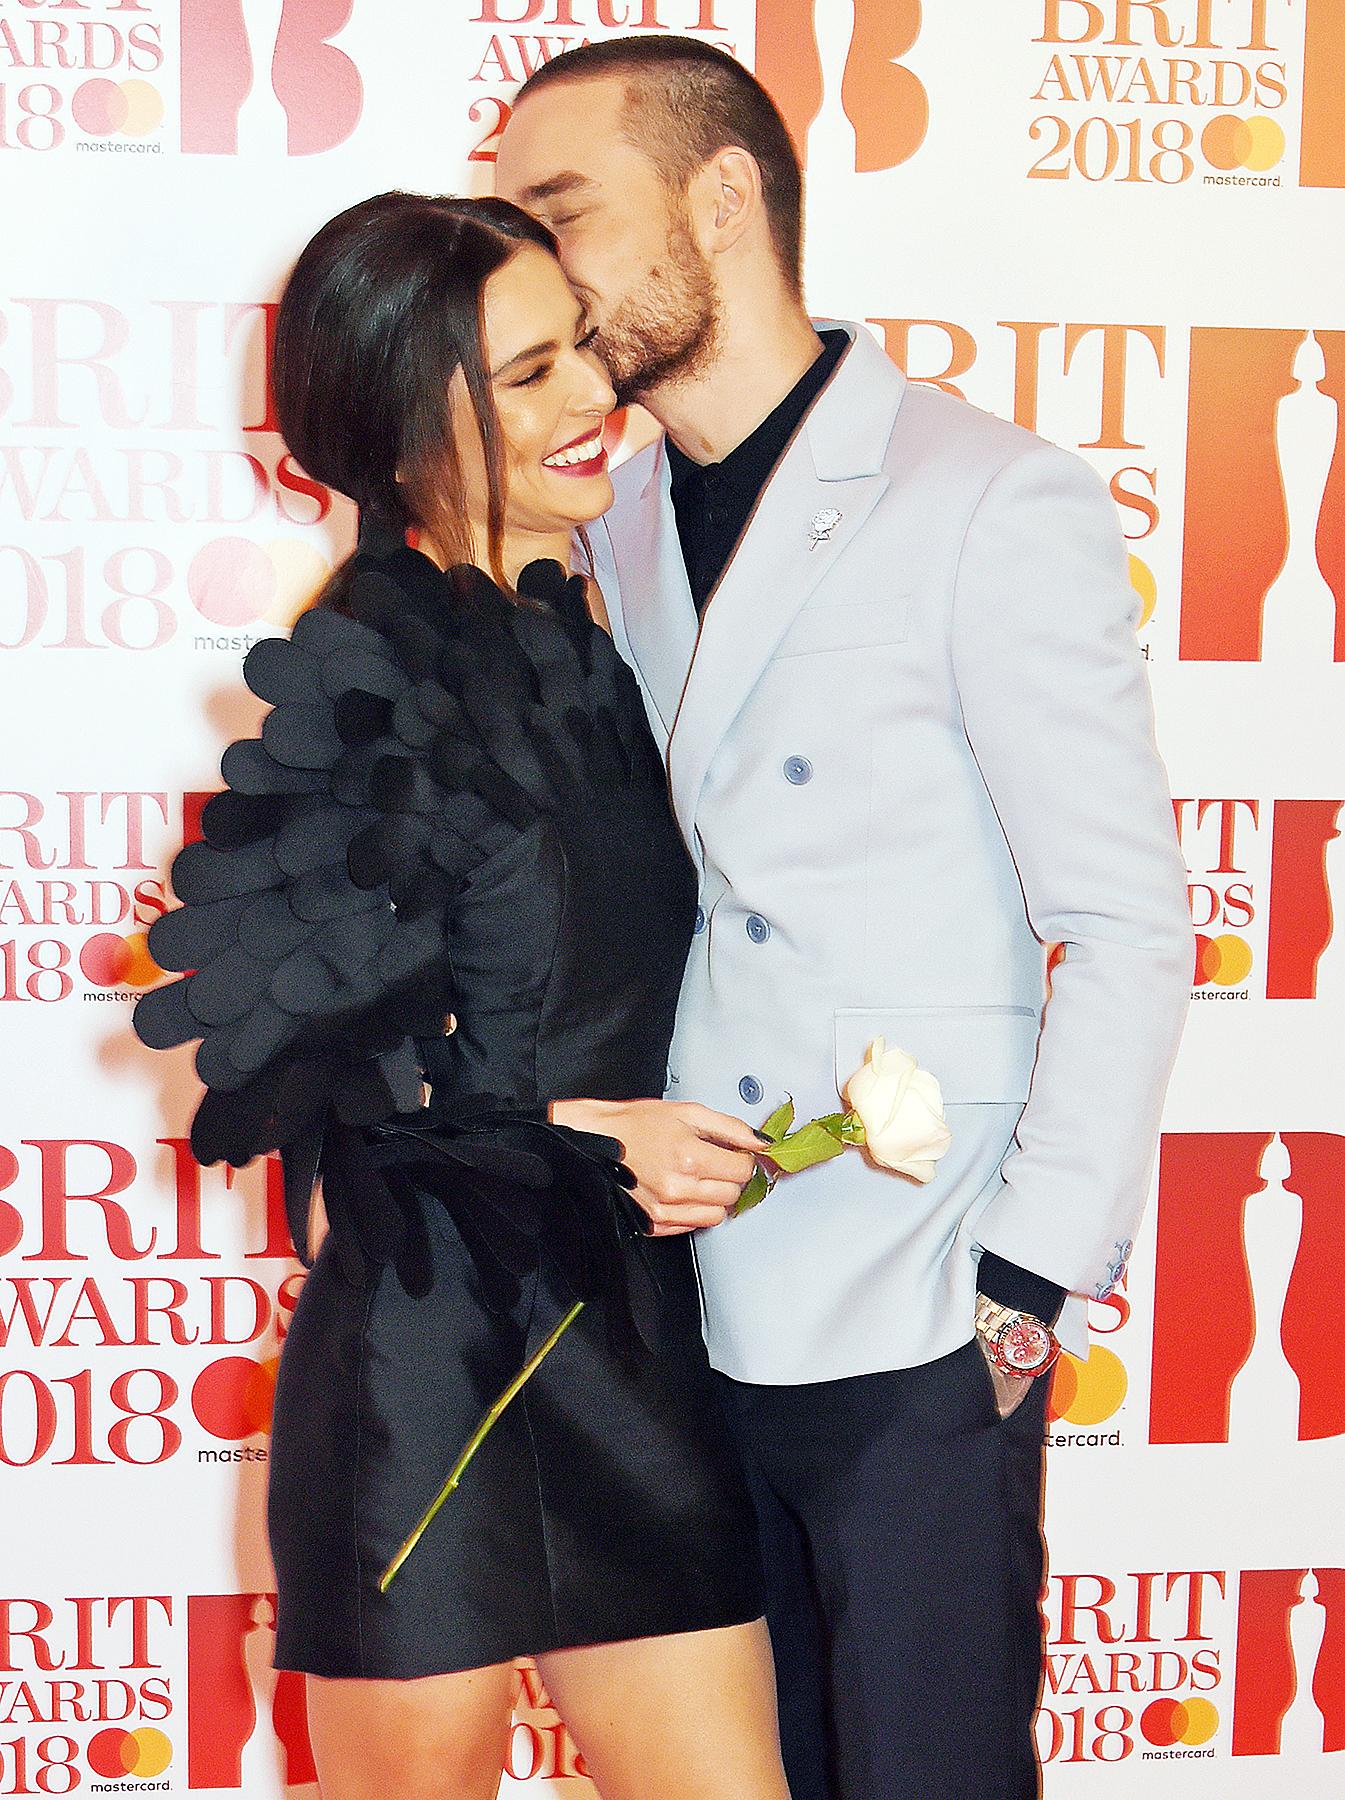 Cheryl Cole Liam Payne kiss